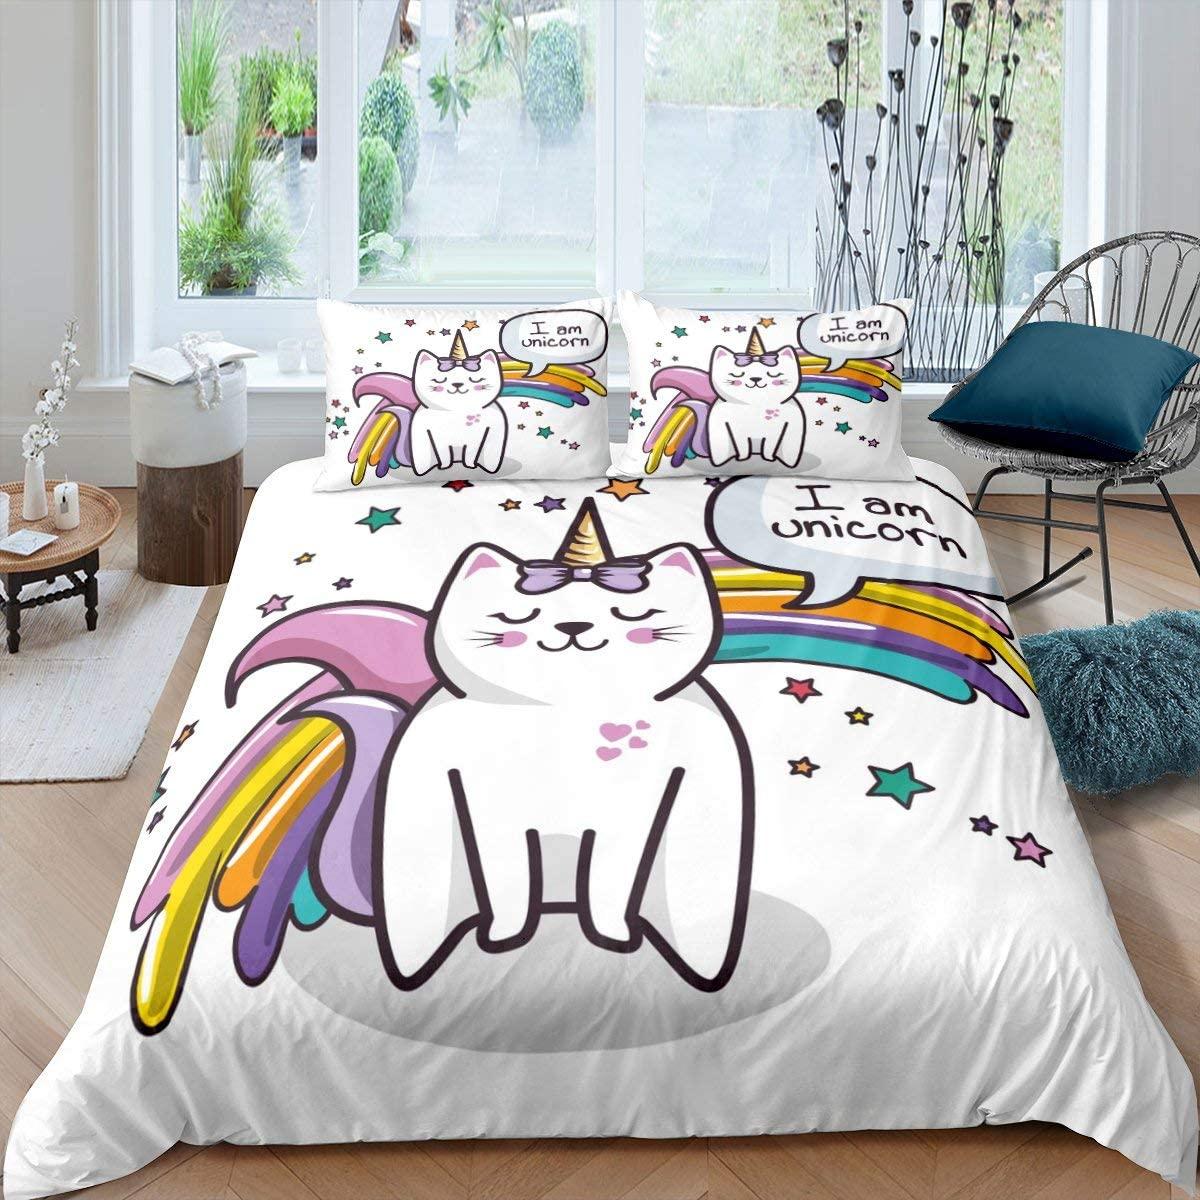 Erosebridal Kids Comforter Cover Cartoon Cat Duvet Cover Rainbow Bedspread Cover Twin Size Starry Sky Animal Bedding Set for Living Room Bedroom Guest Room Decorative, Colorful Iridescent